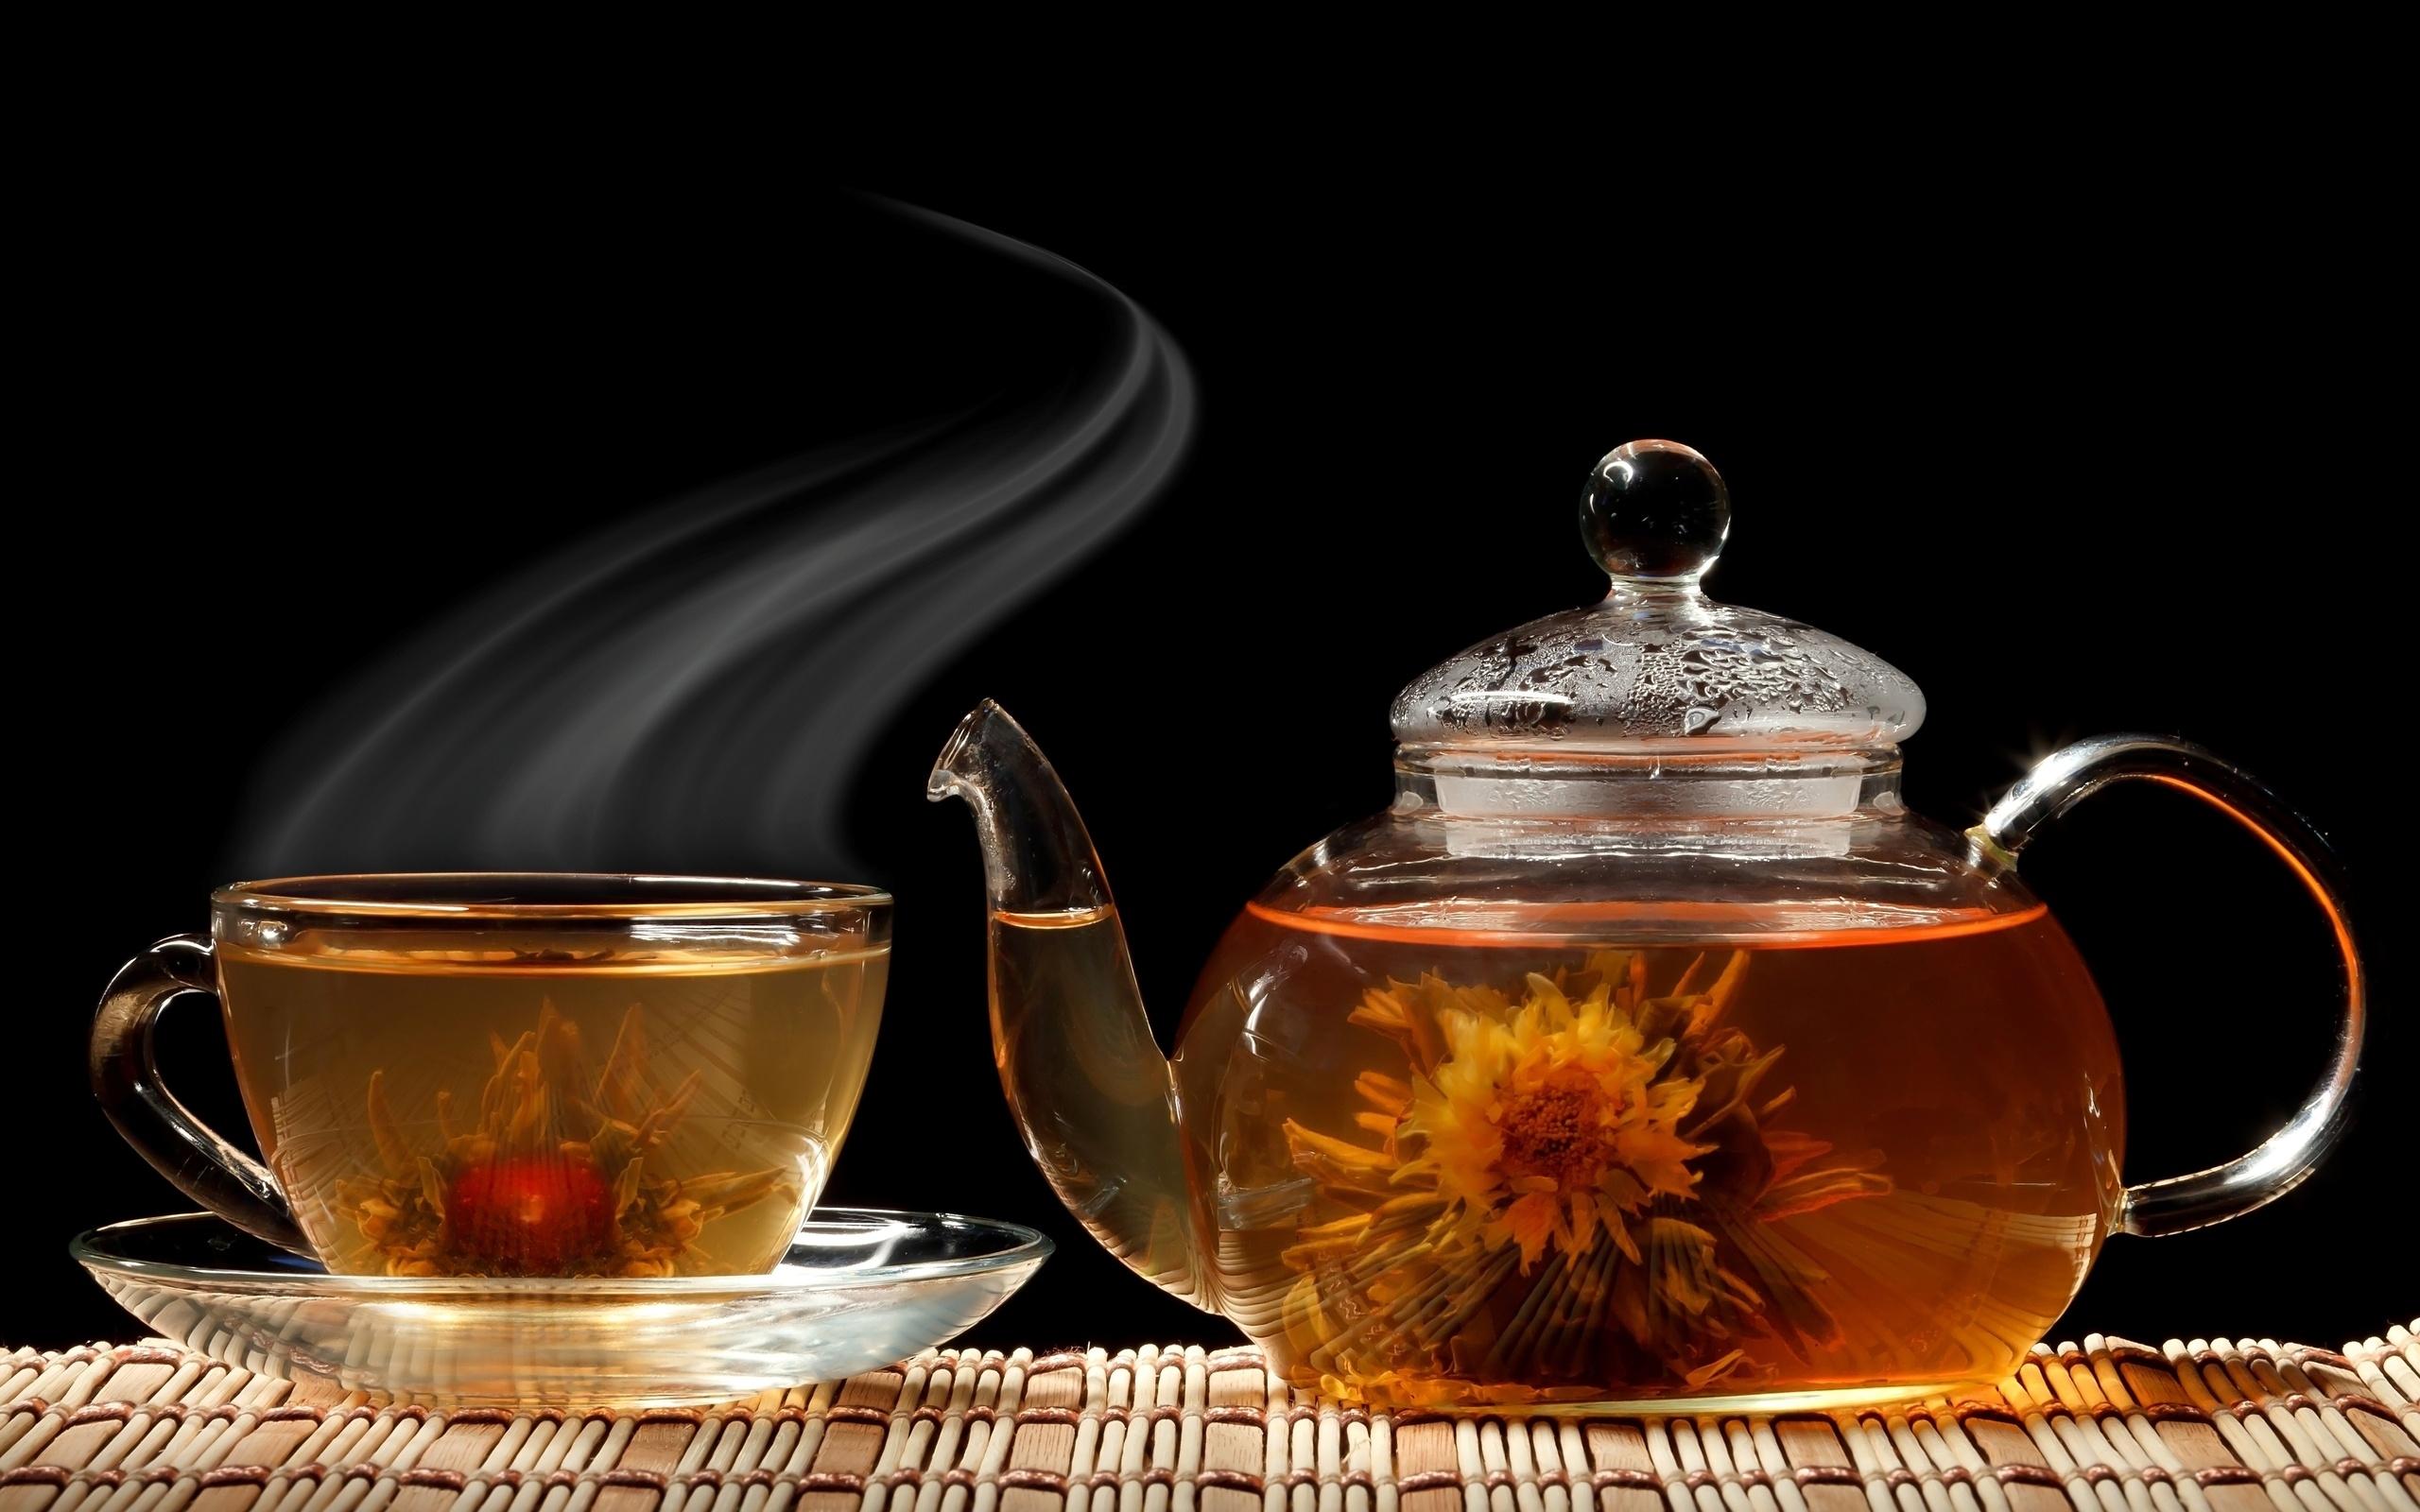 Hintergrundbilder : Tee, Kessel, Dampf, Tasse 2560x1600 - - 1041879 ...